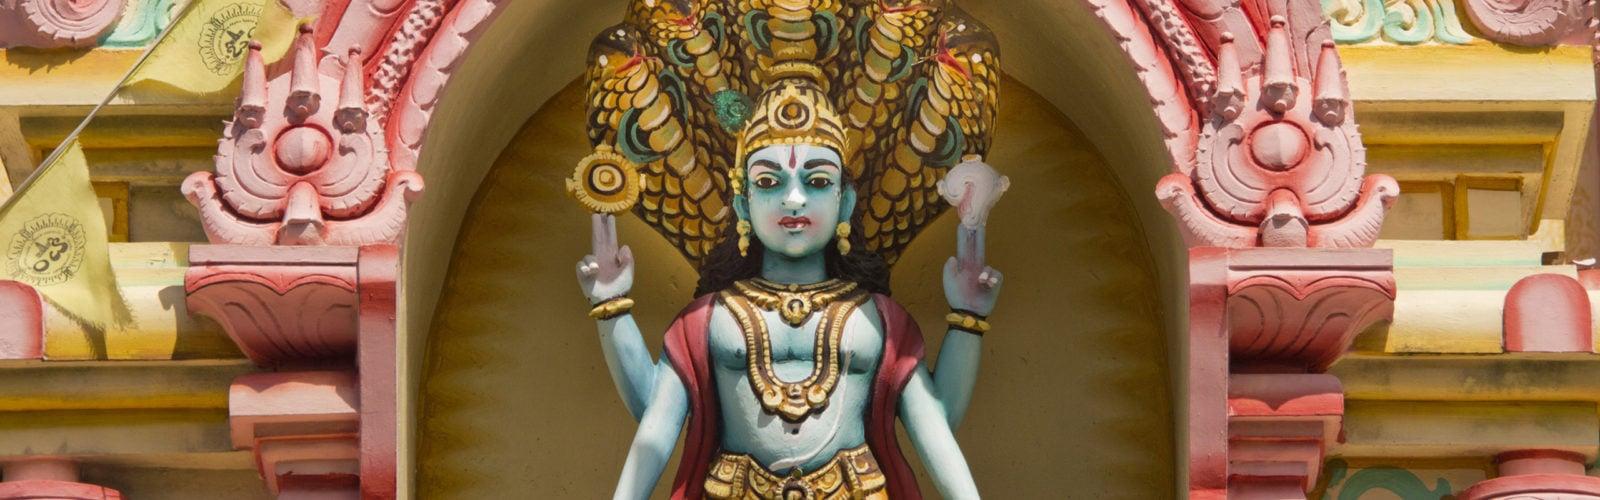 hindu-temple-statue-mauritius